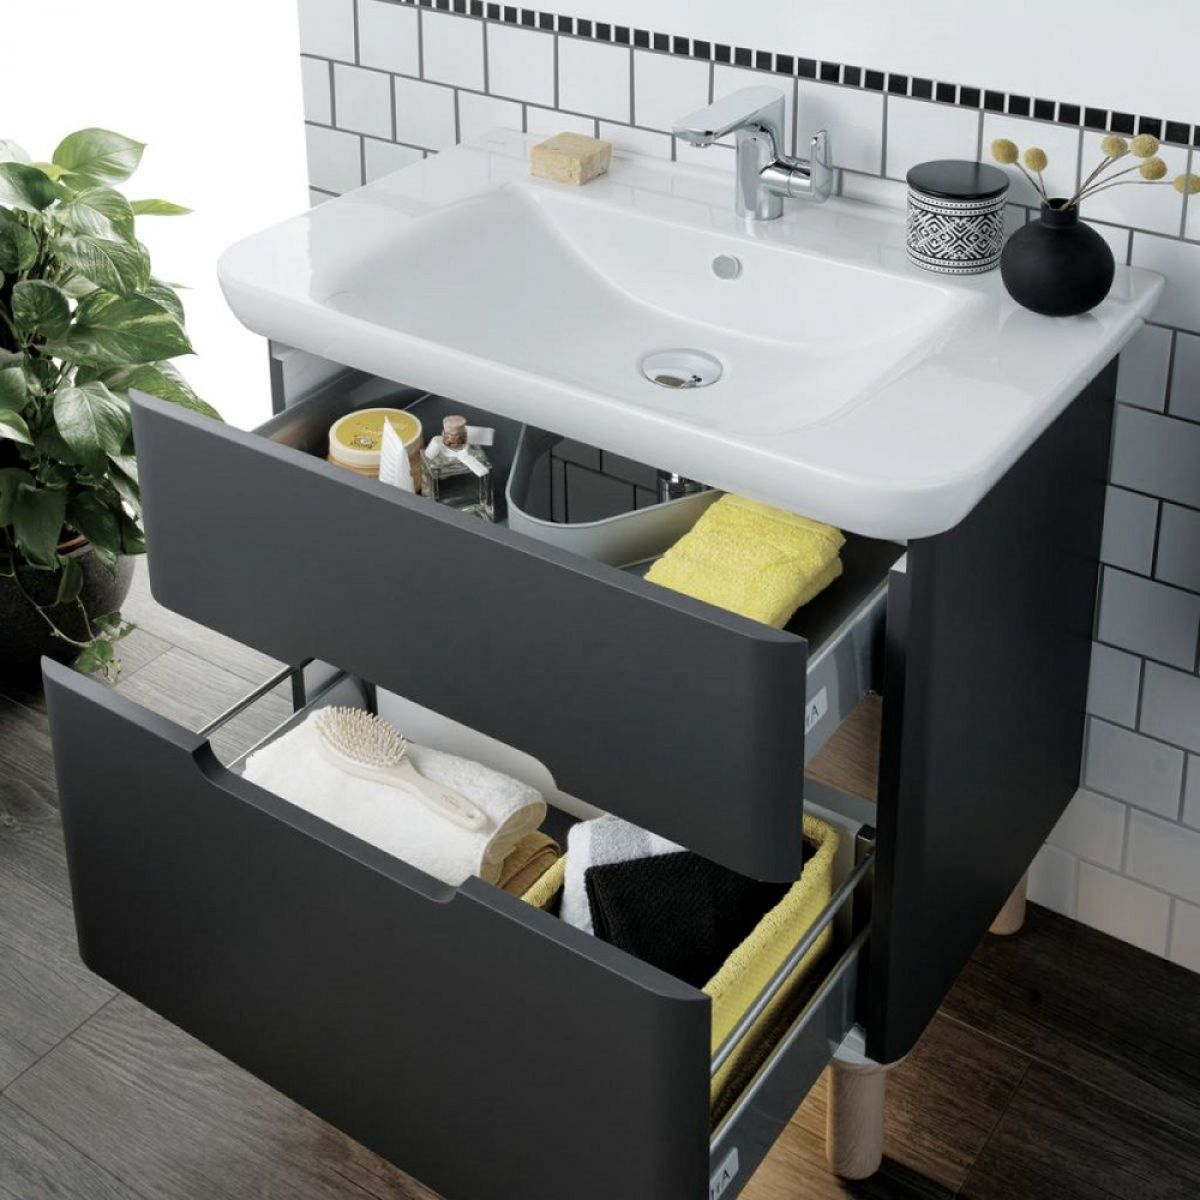 Vitra Sento Vanity Unit with 2 Drawers : UK Bathrooms